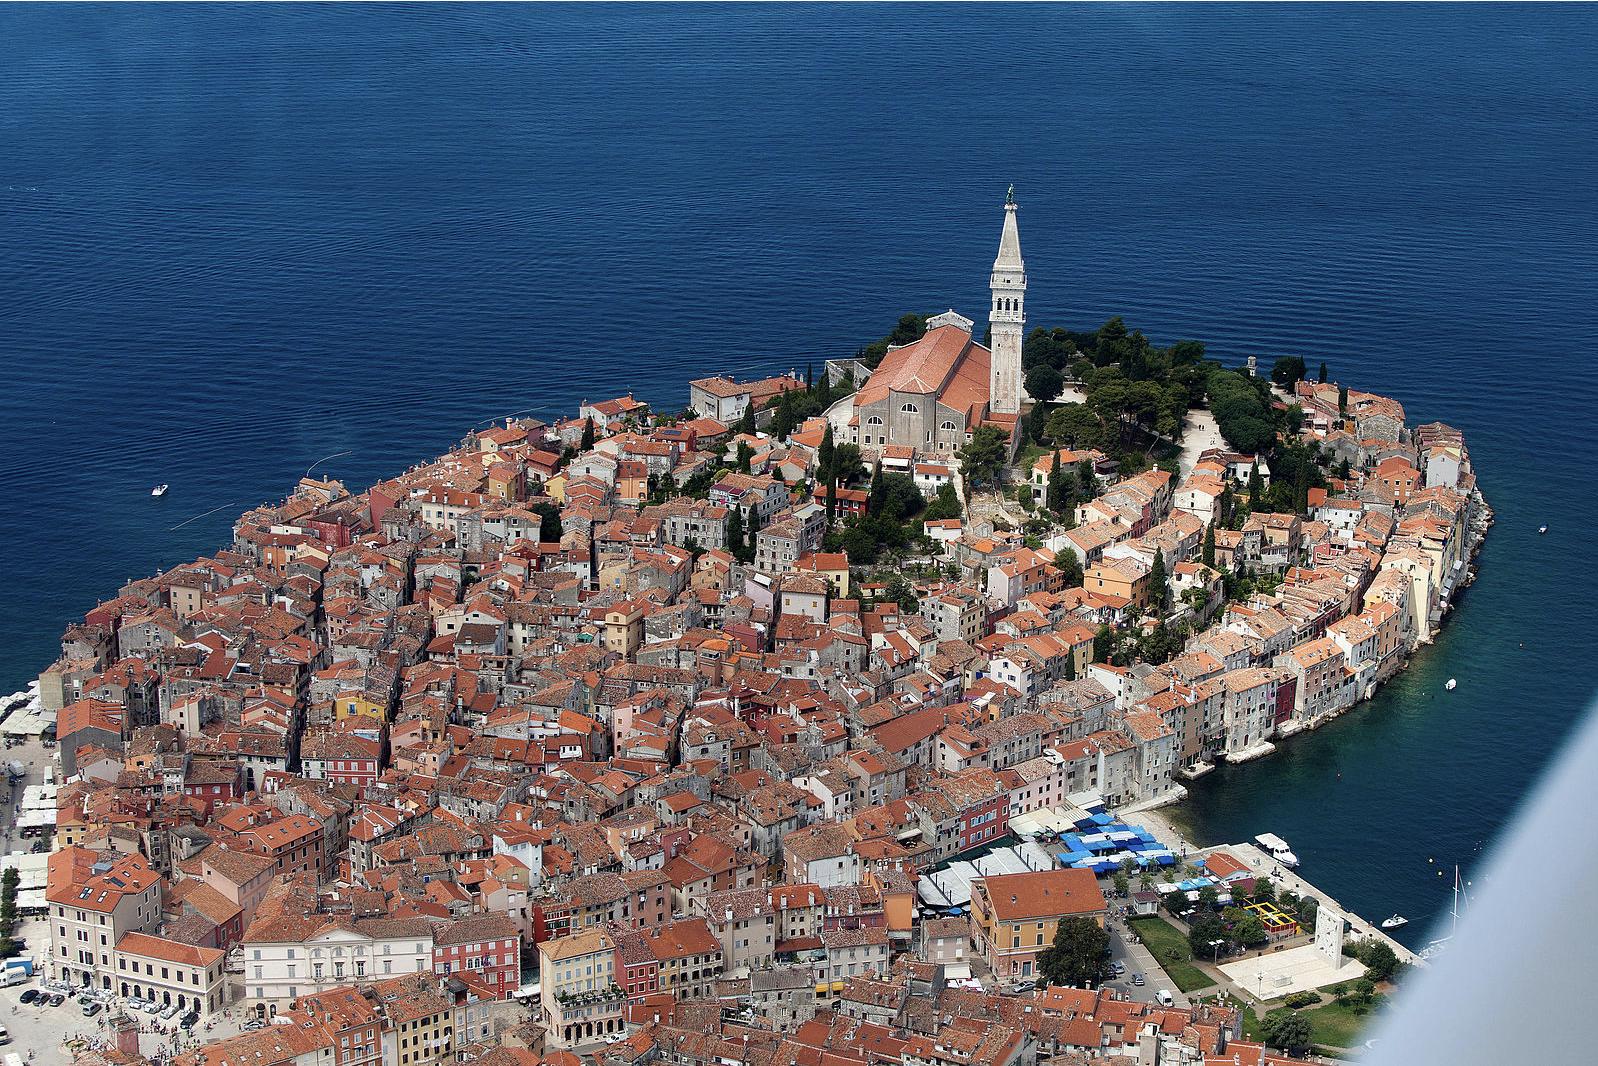 Town of Rovinj, Croatia (Wikicommons,  Jeroen Komen)